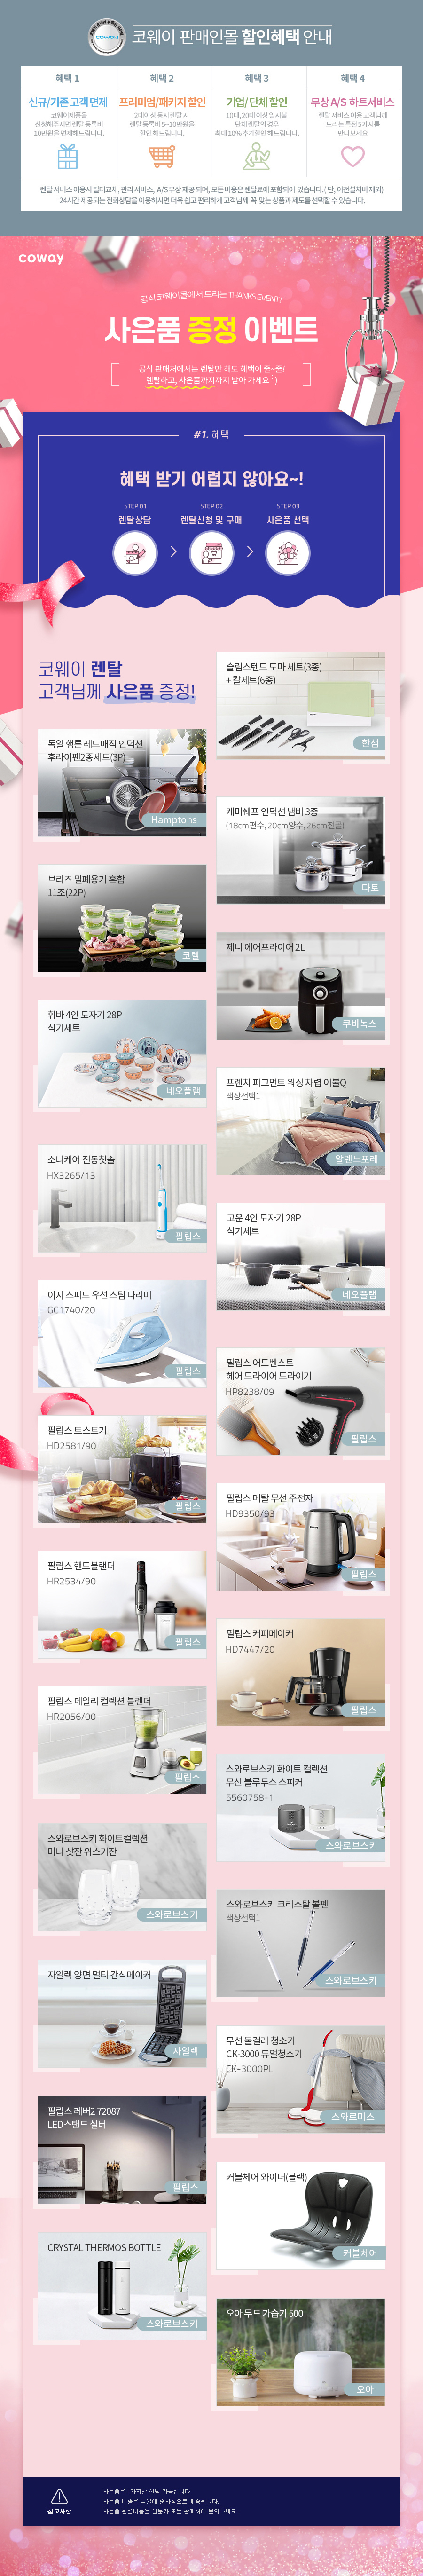 shop_guide_benefit2.jpg